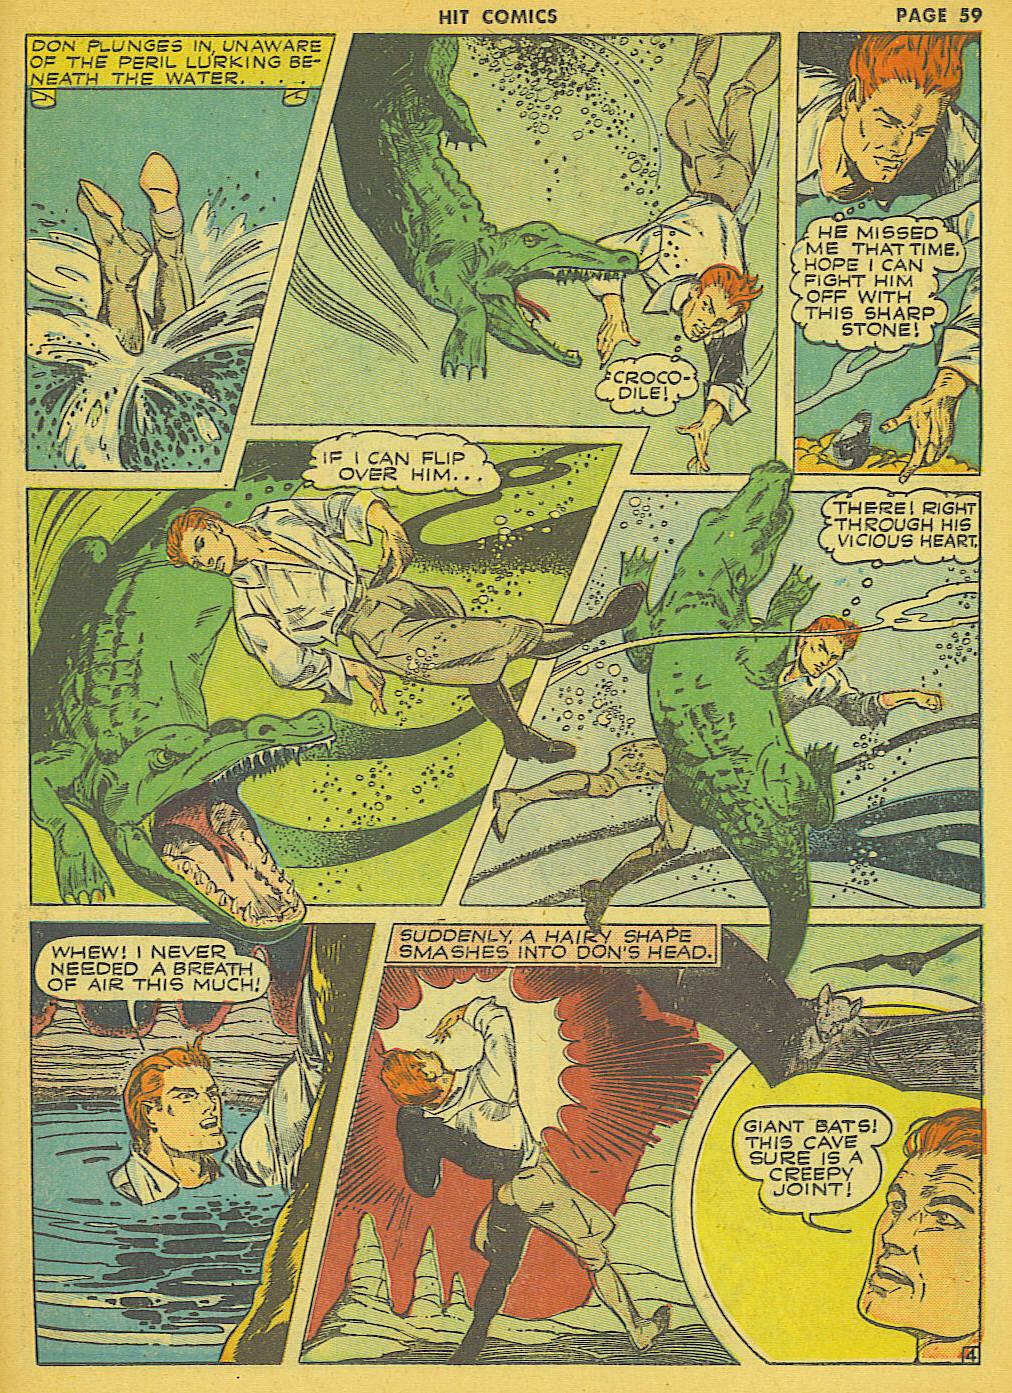 Read online Hit Comics comic -  Issue #21 - 61